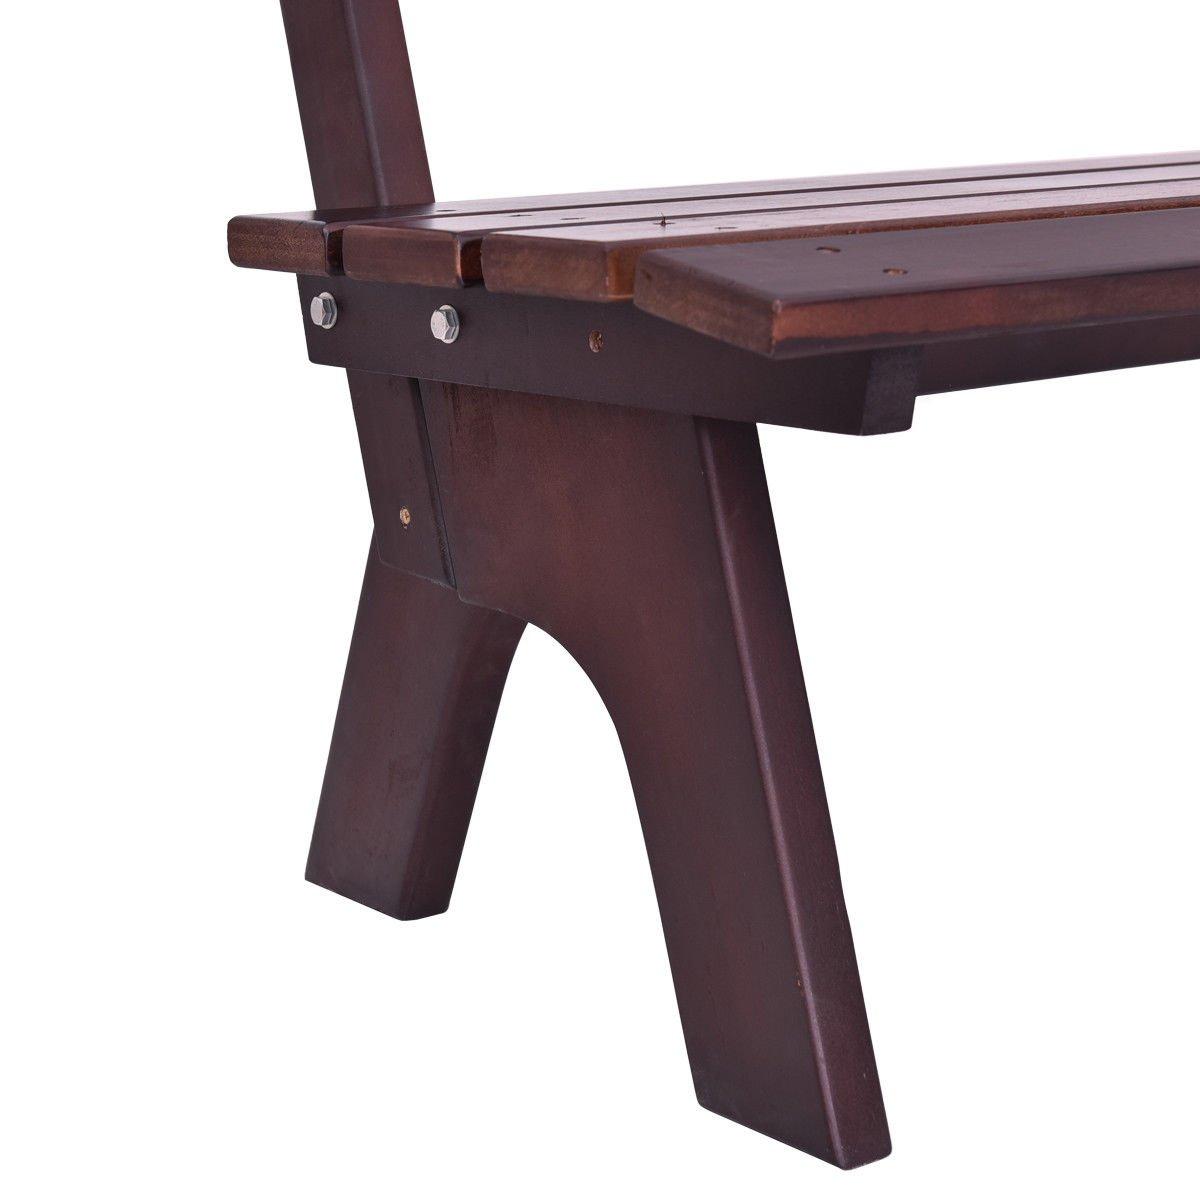 Giantex Wooden Garden Bench Chair Wood Frame Outdoor Yard Deck Furniture 5 Ft 3 Seats (Brown)